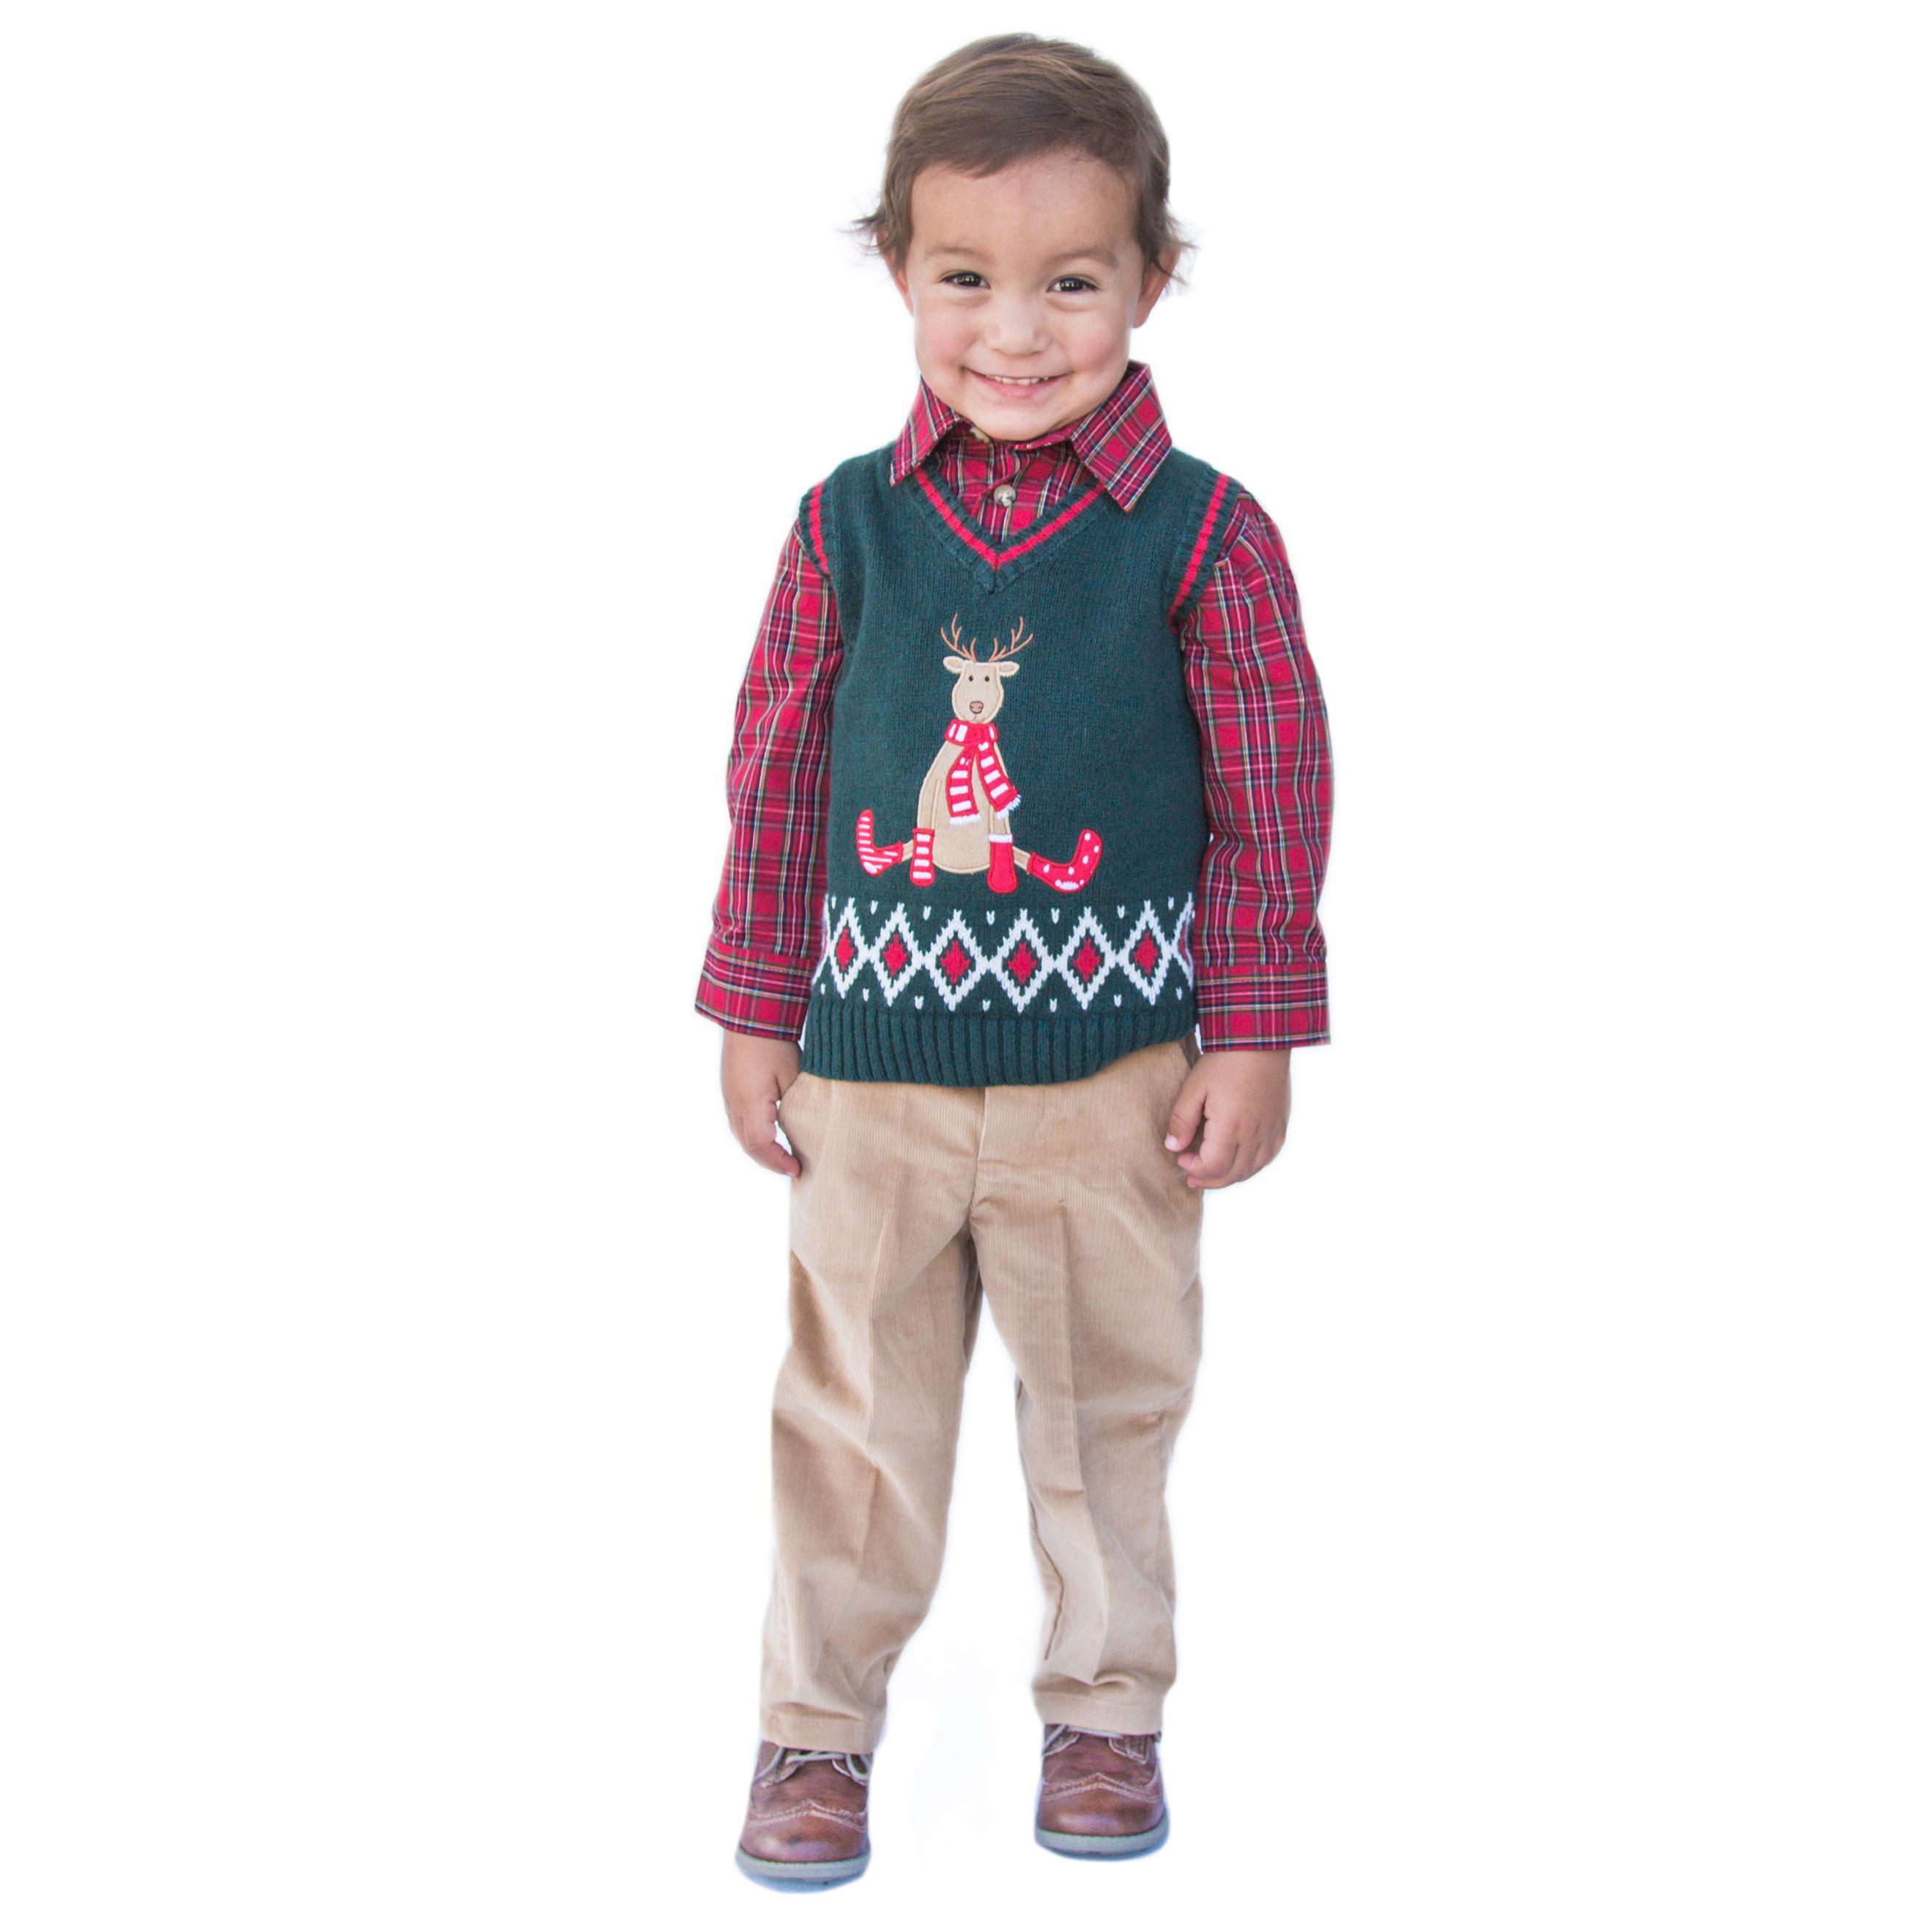 Good Lad Newborn//Infant Boy Blue Seersucker Smocked Shortall Set with Nautical Embroideries